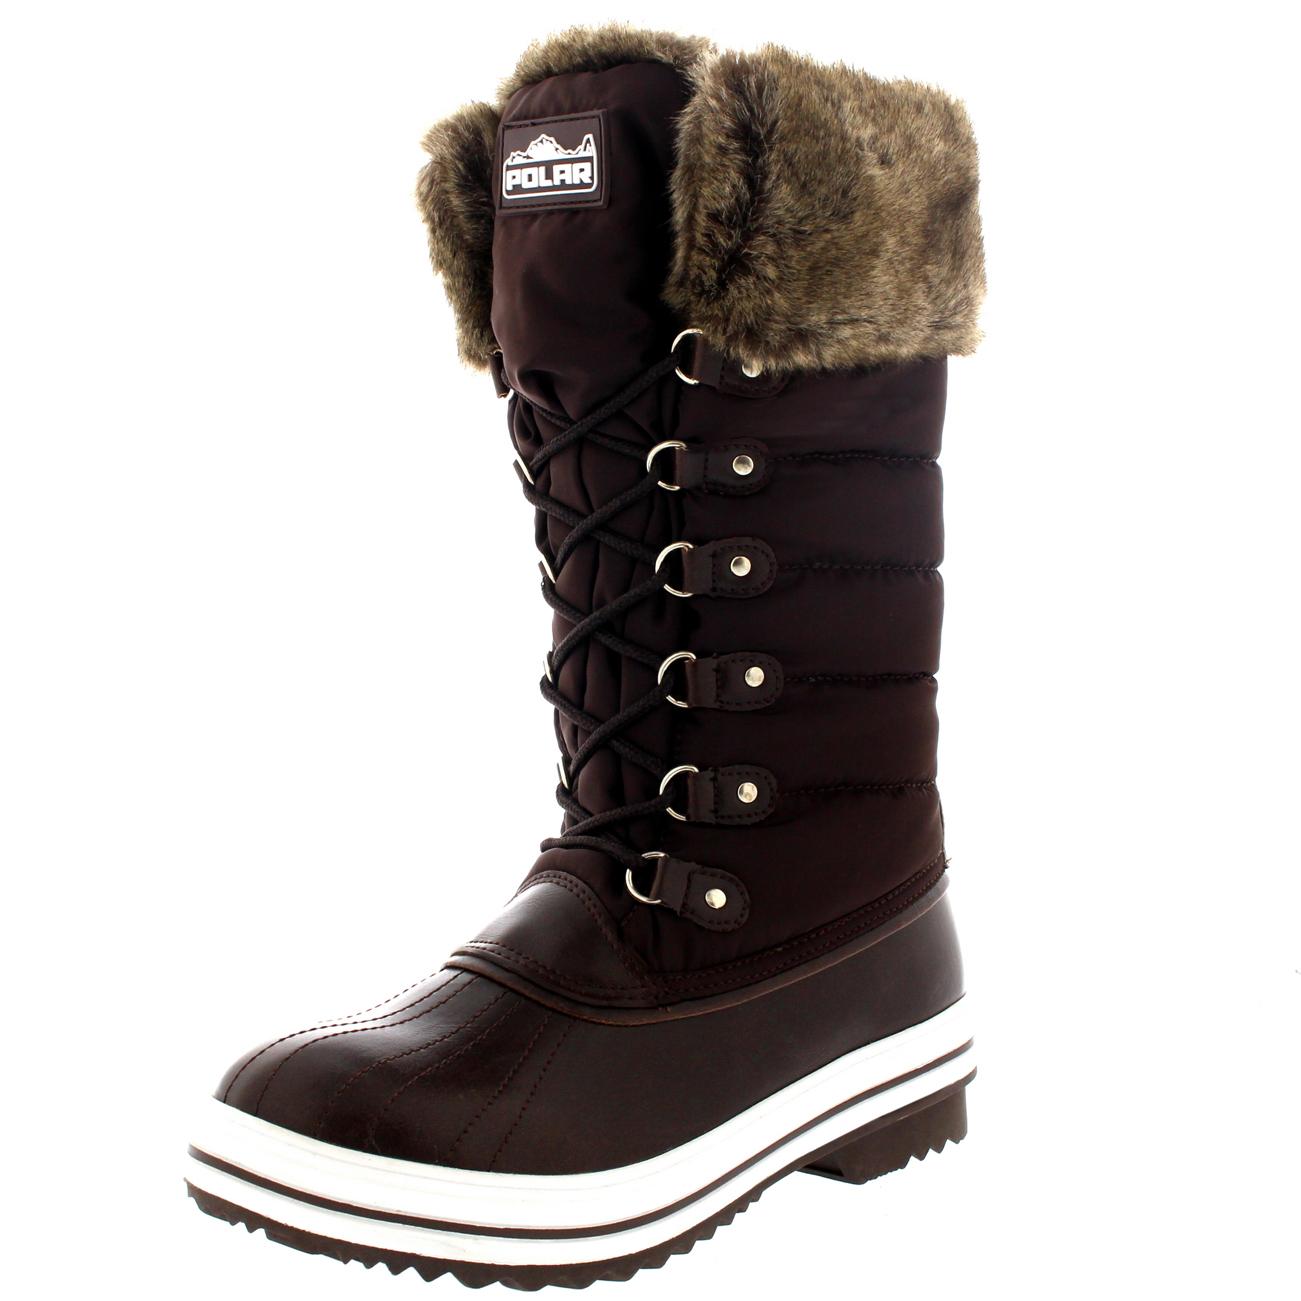 Womens Nylon Warm Side Zip Fur Duck Muck Lace Up Rain Winter Snow ...